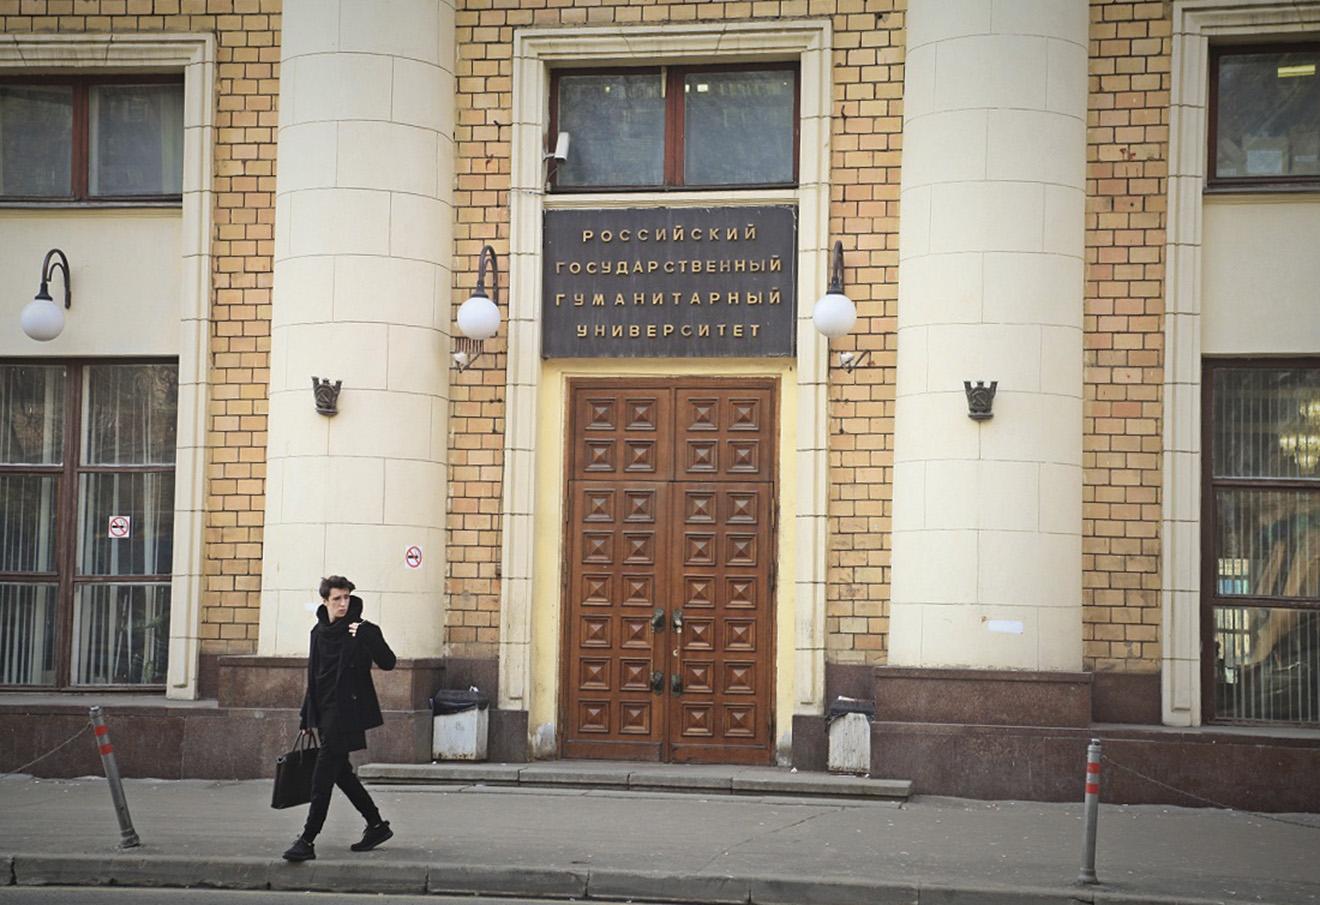 Фото: Маша Кособокова / ucheba.ru